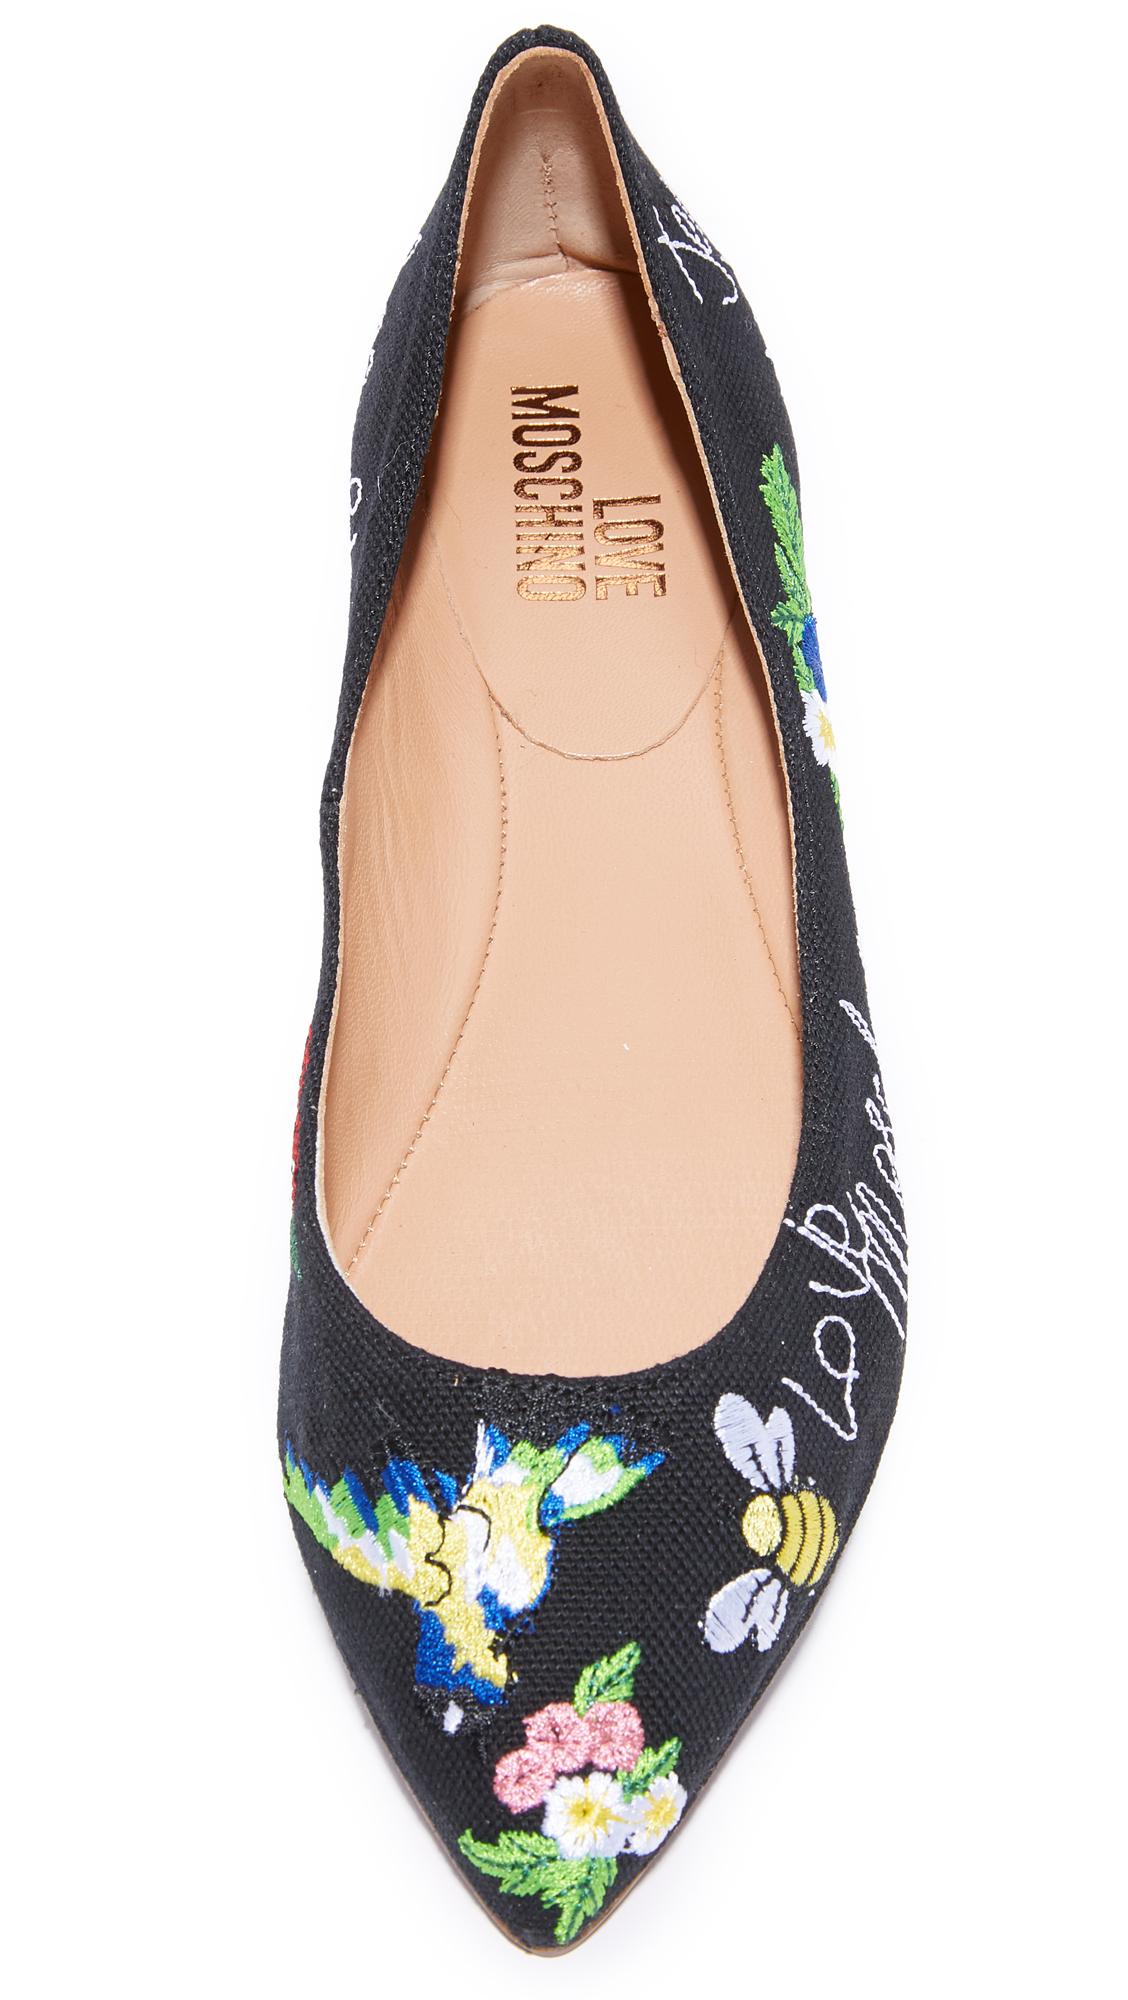 hot product available meet Moschino Love Moschino Ballerina Flats | SHOPBOP